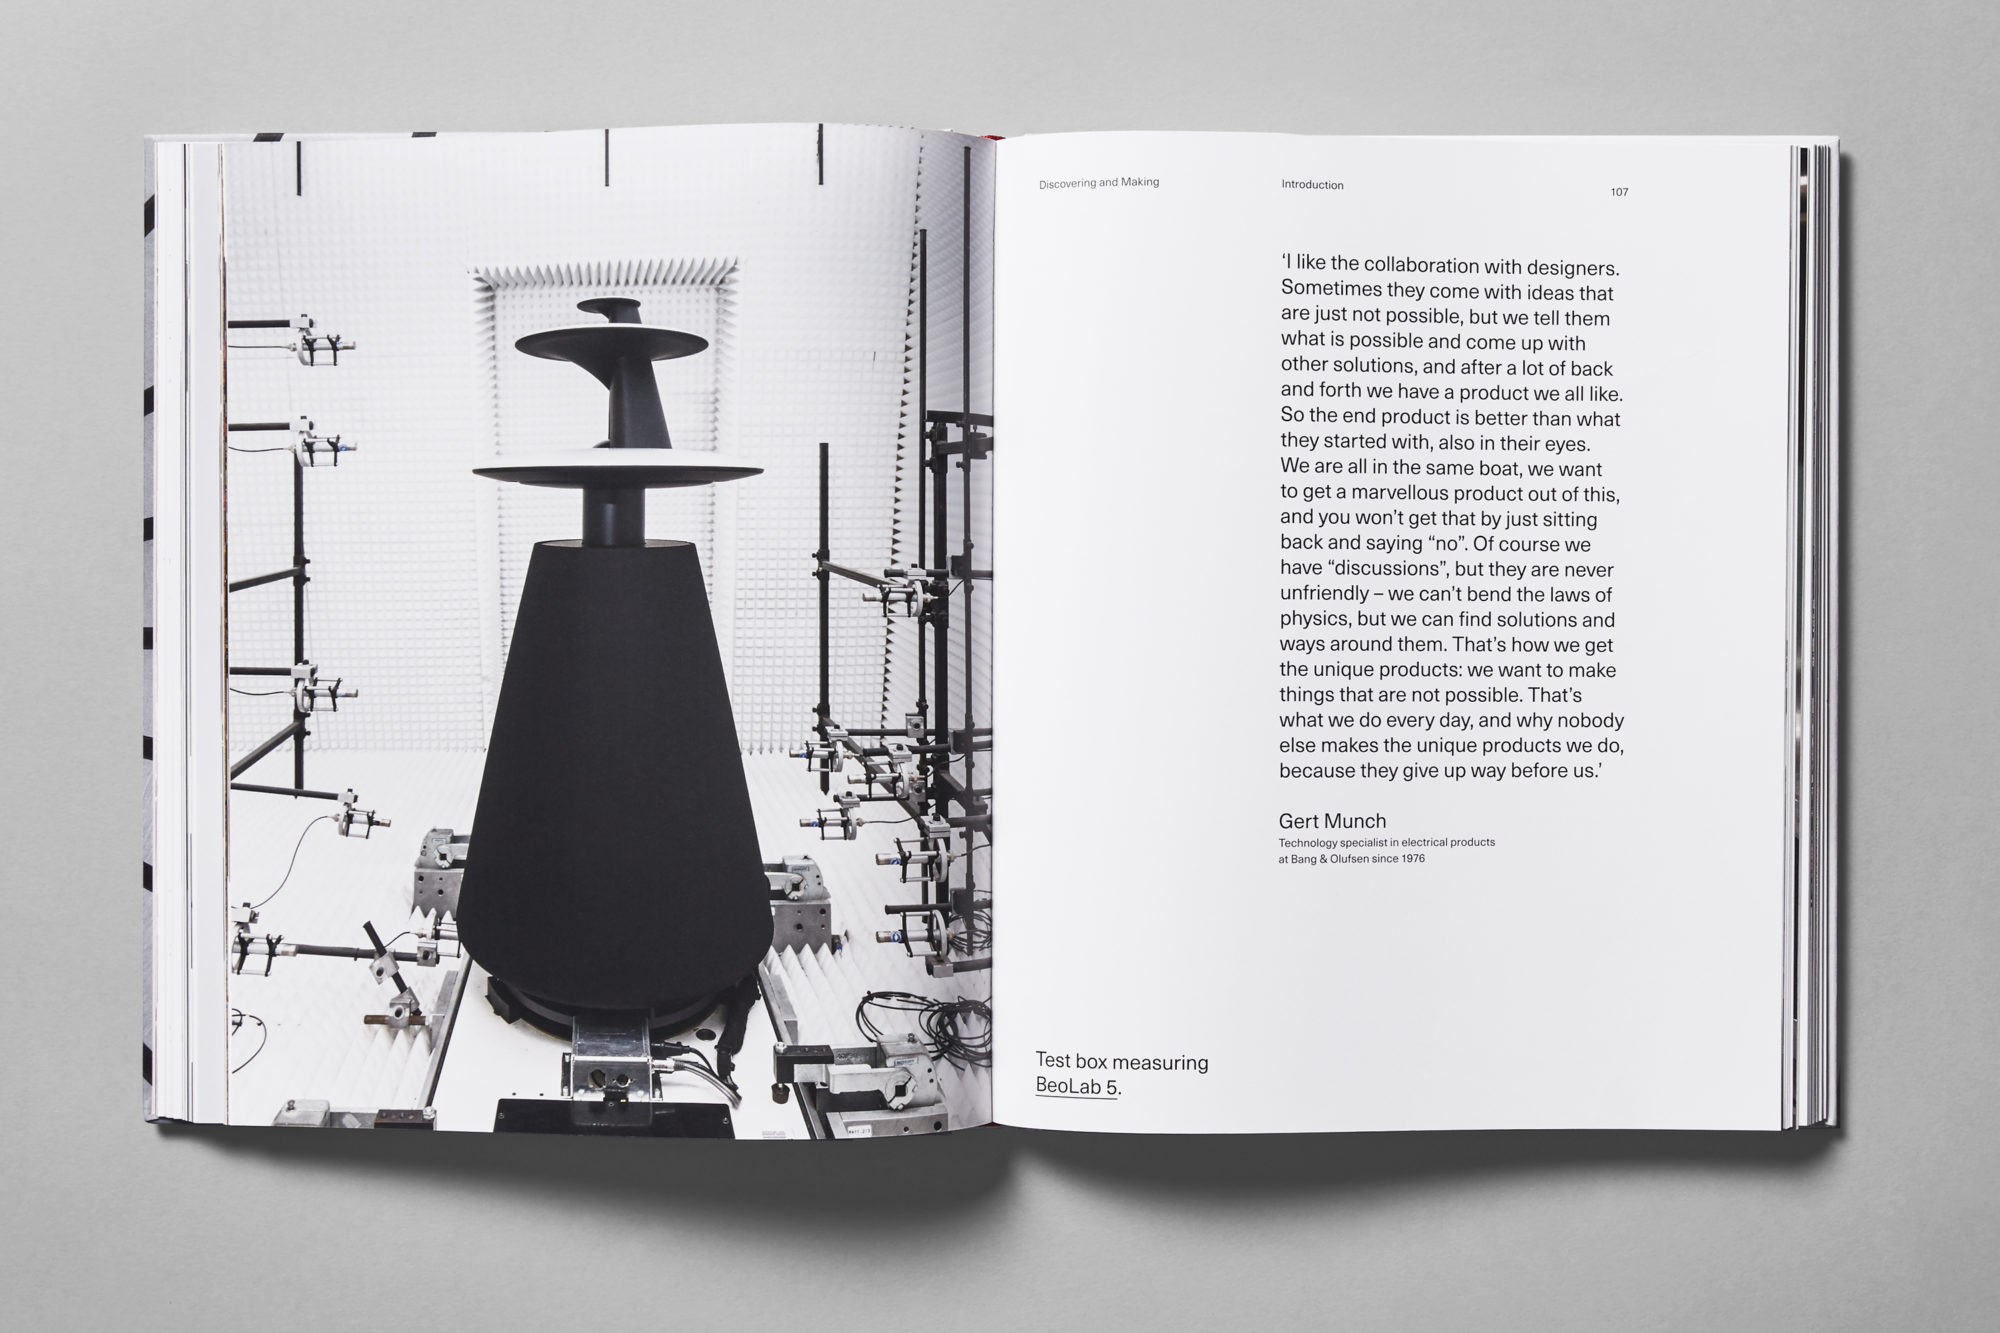 bang olufsen studio claus due graphic design studio copenhagen denmark. Black Bedroom Furniture Sets. Home Design Ideas